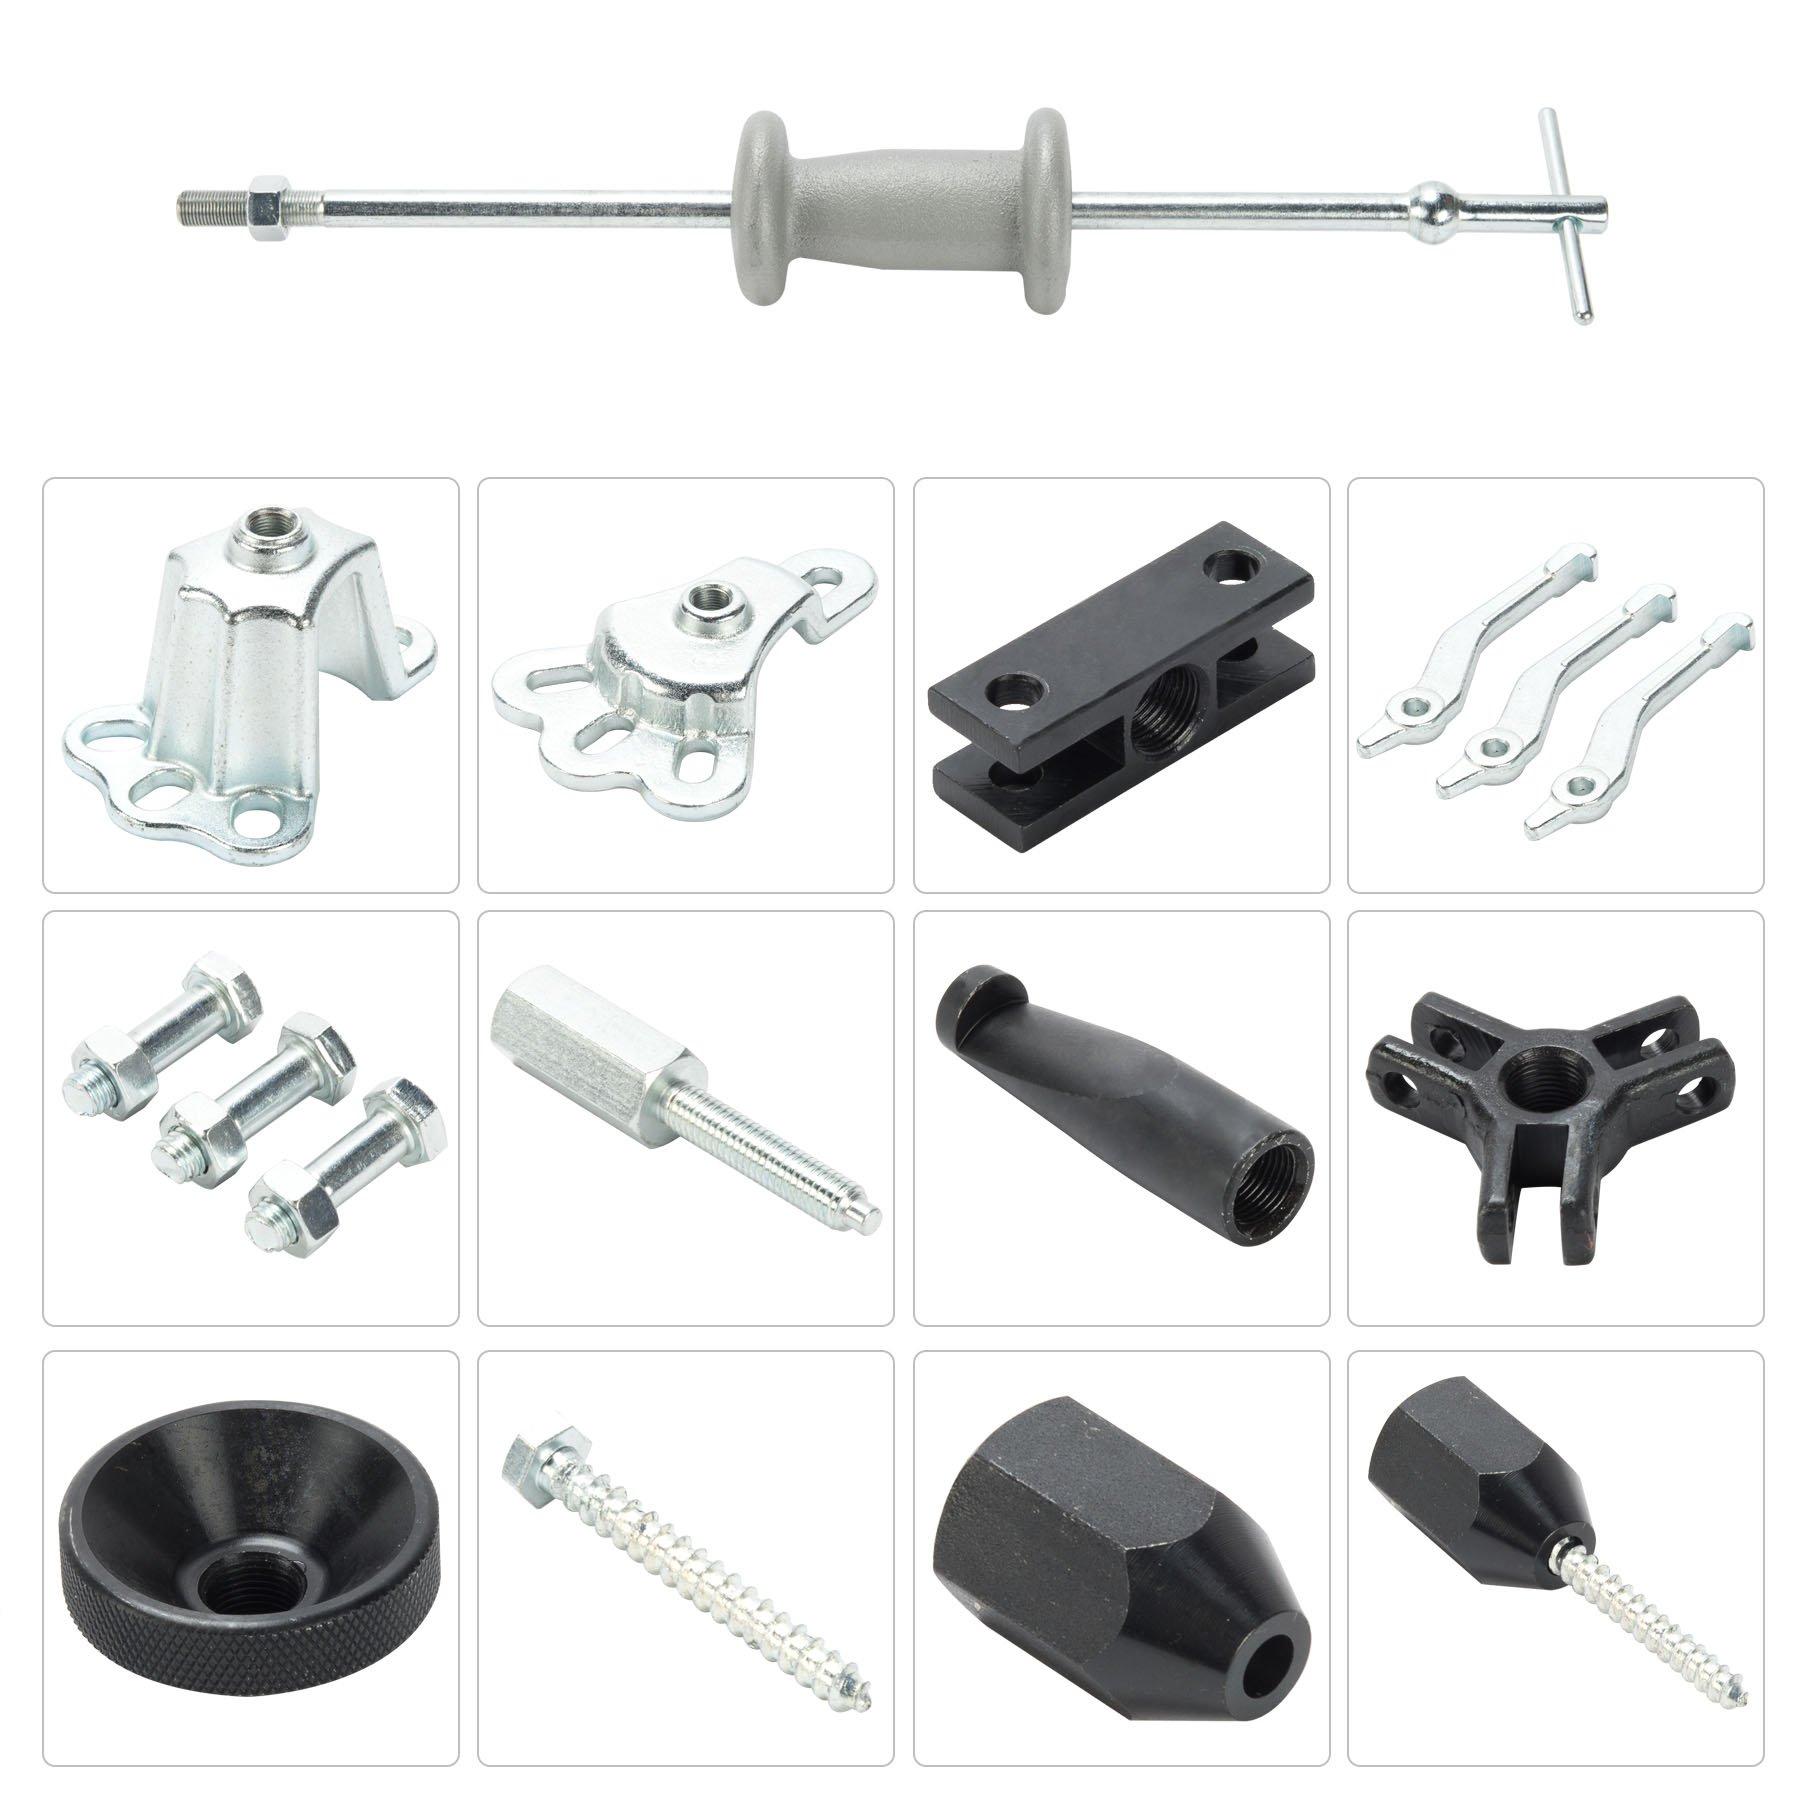 OrionMotorTech 9-Way Slide Hammer Puller Set, Front Wheel Hub Bearing Remover & Rear Wheel Axle Shaft Puller Tool Kit by OrionMotorTech (Image #6)